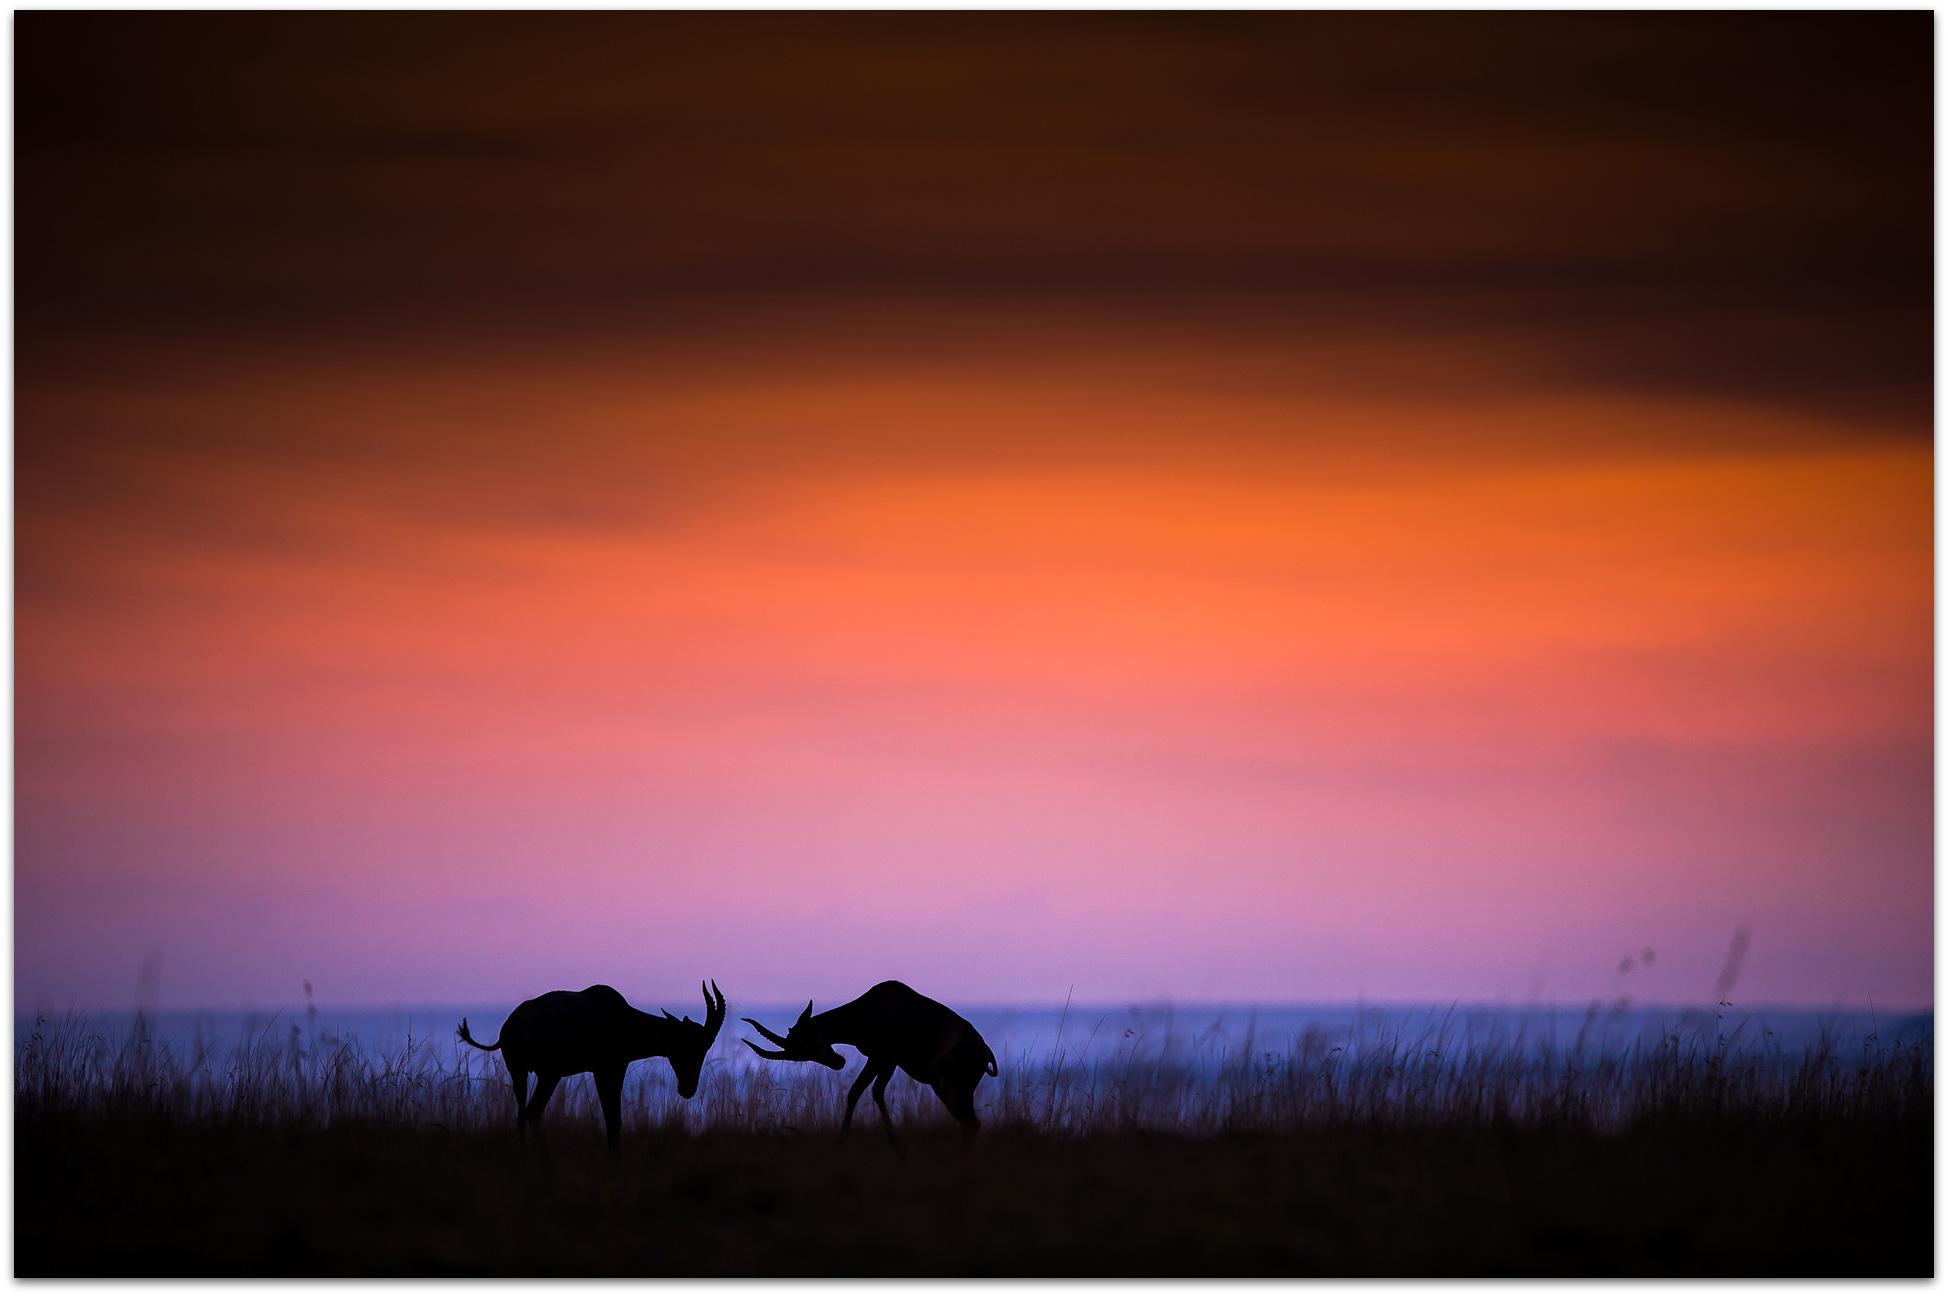 Topi sparring in the Maasai Mara